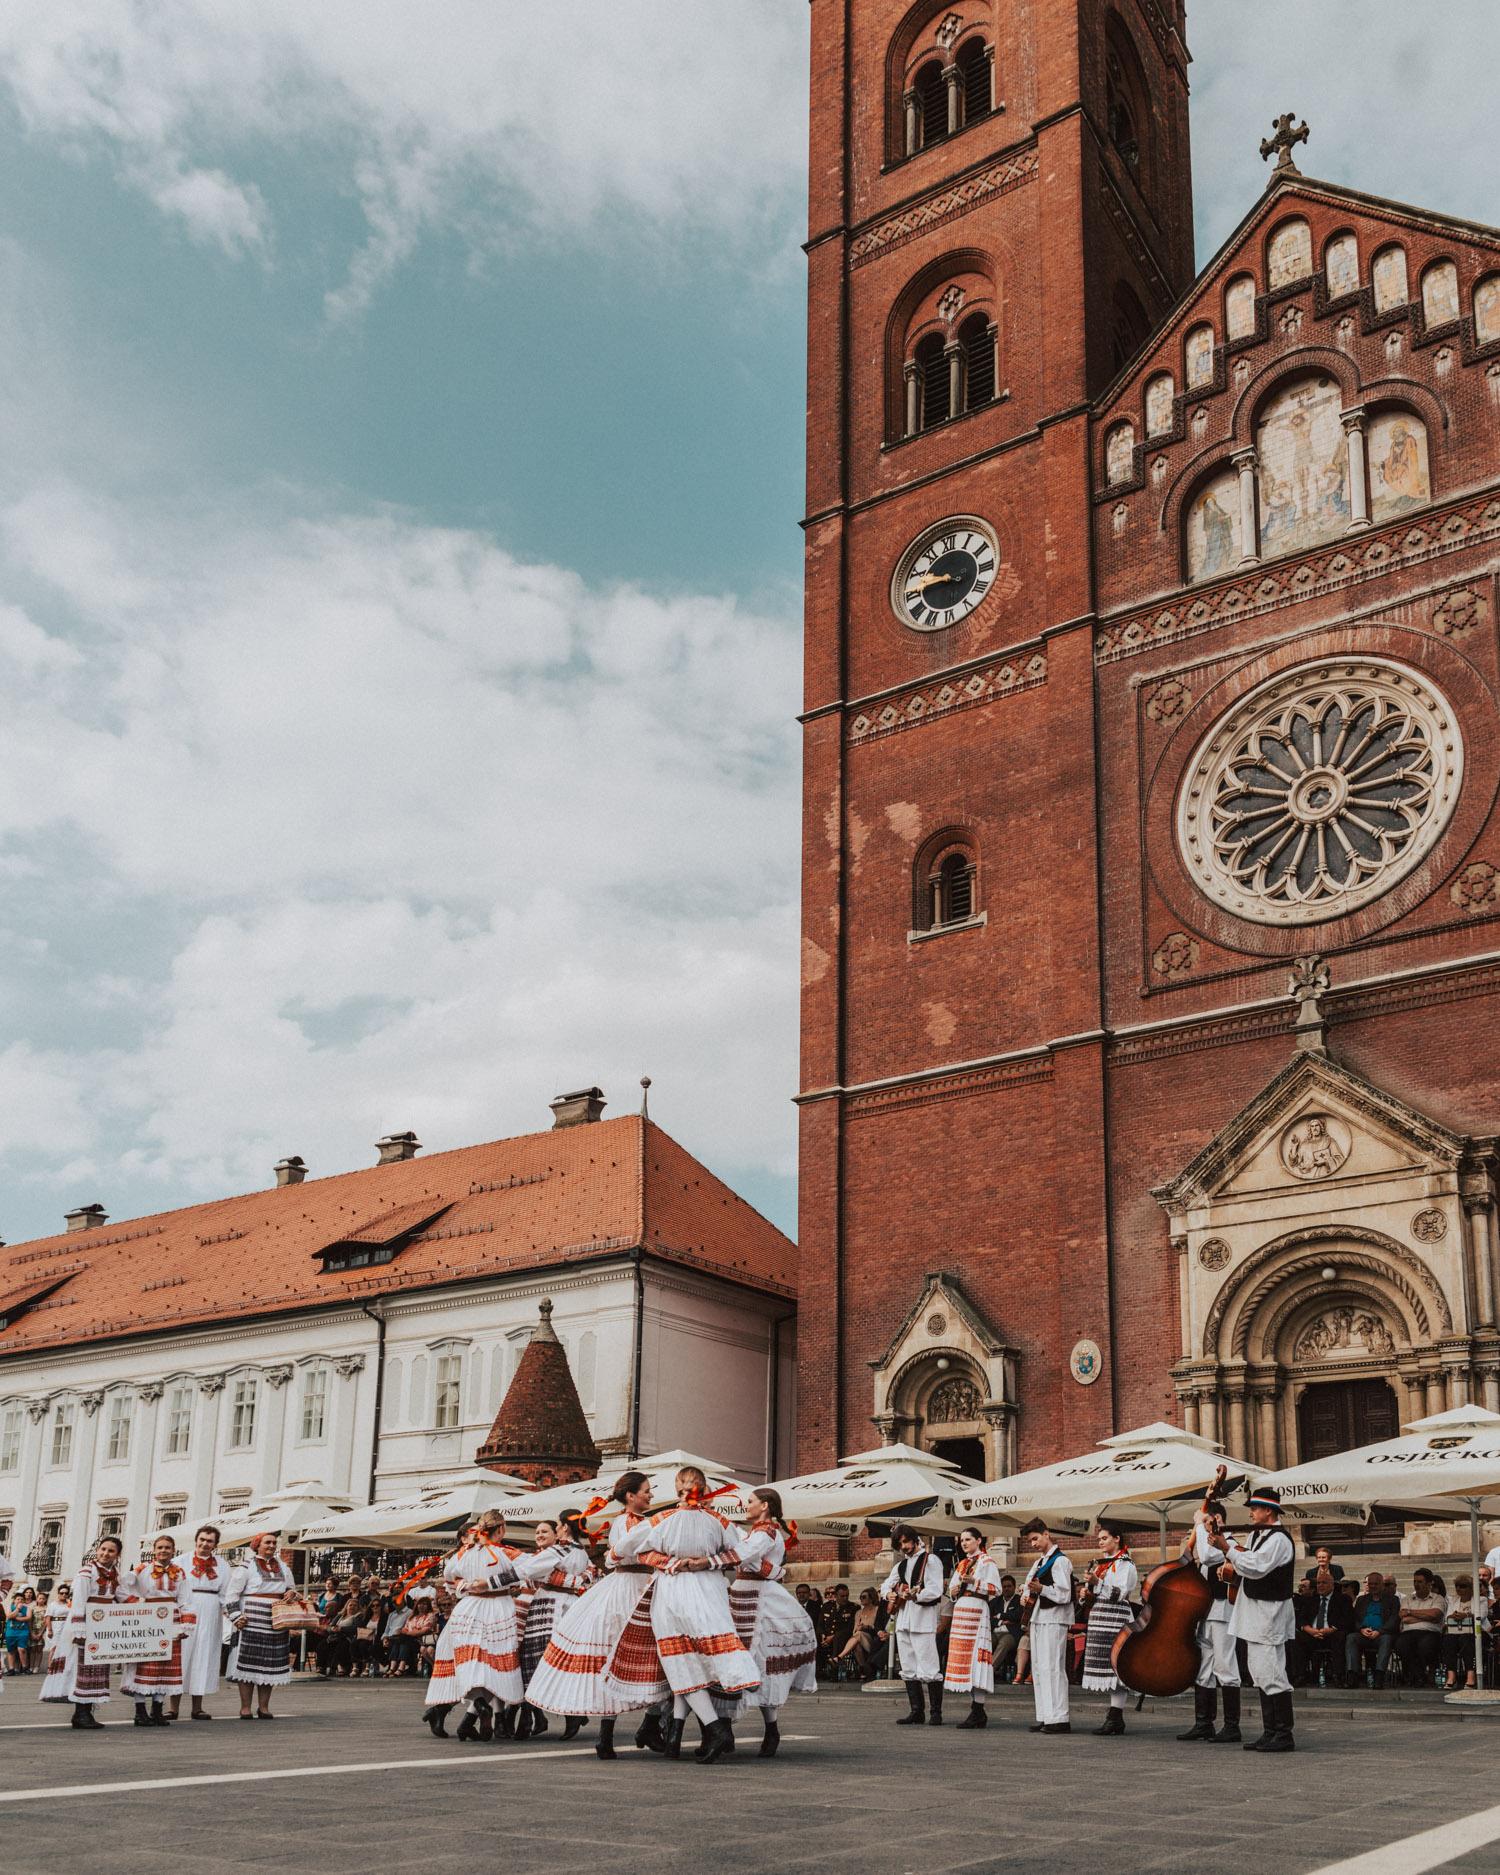 Đakovo Embroidery Festival, Slavonia, Croatia